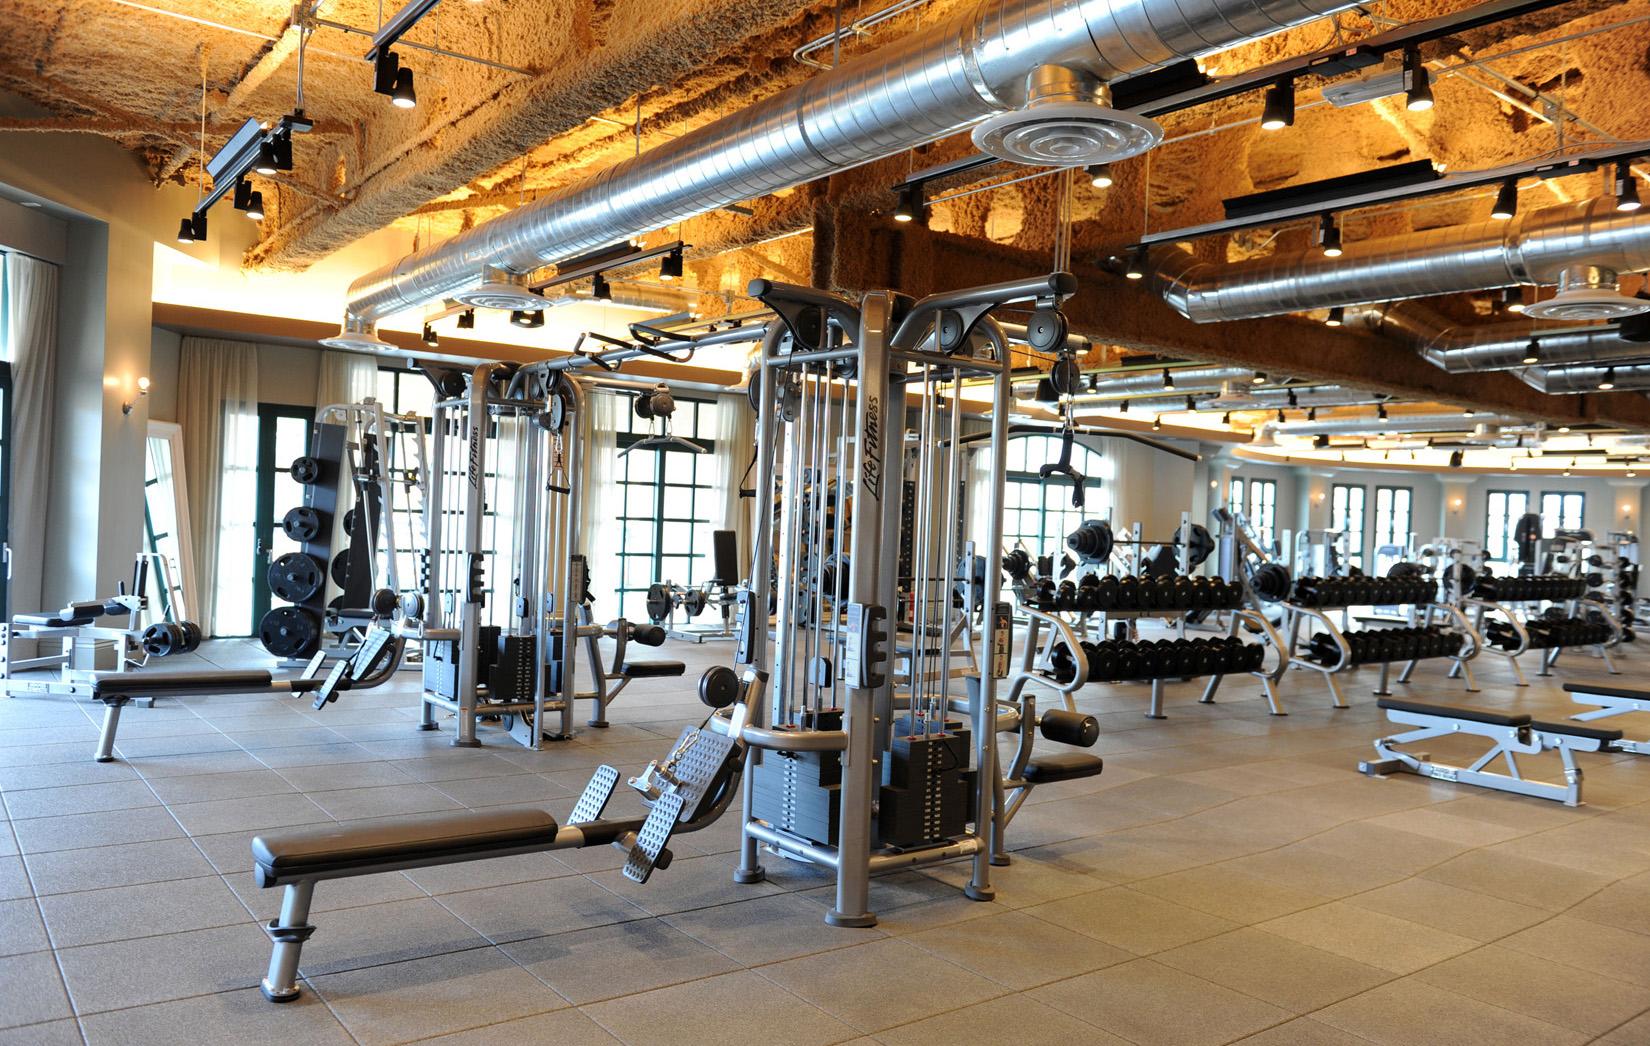 Wallpaper Sport Interior Design: Gym Wallpapers High Quality